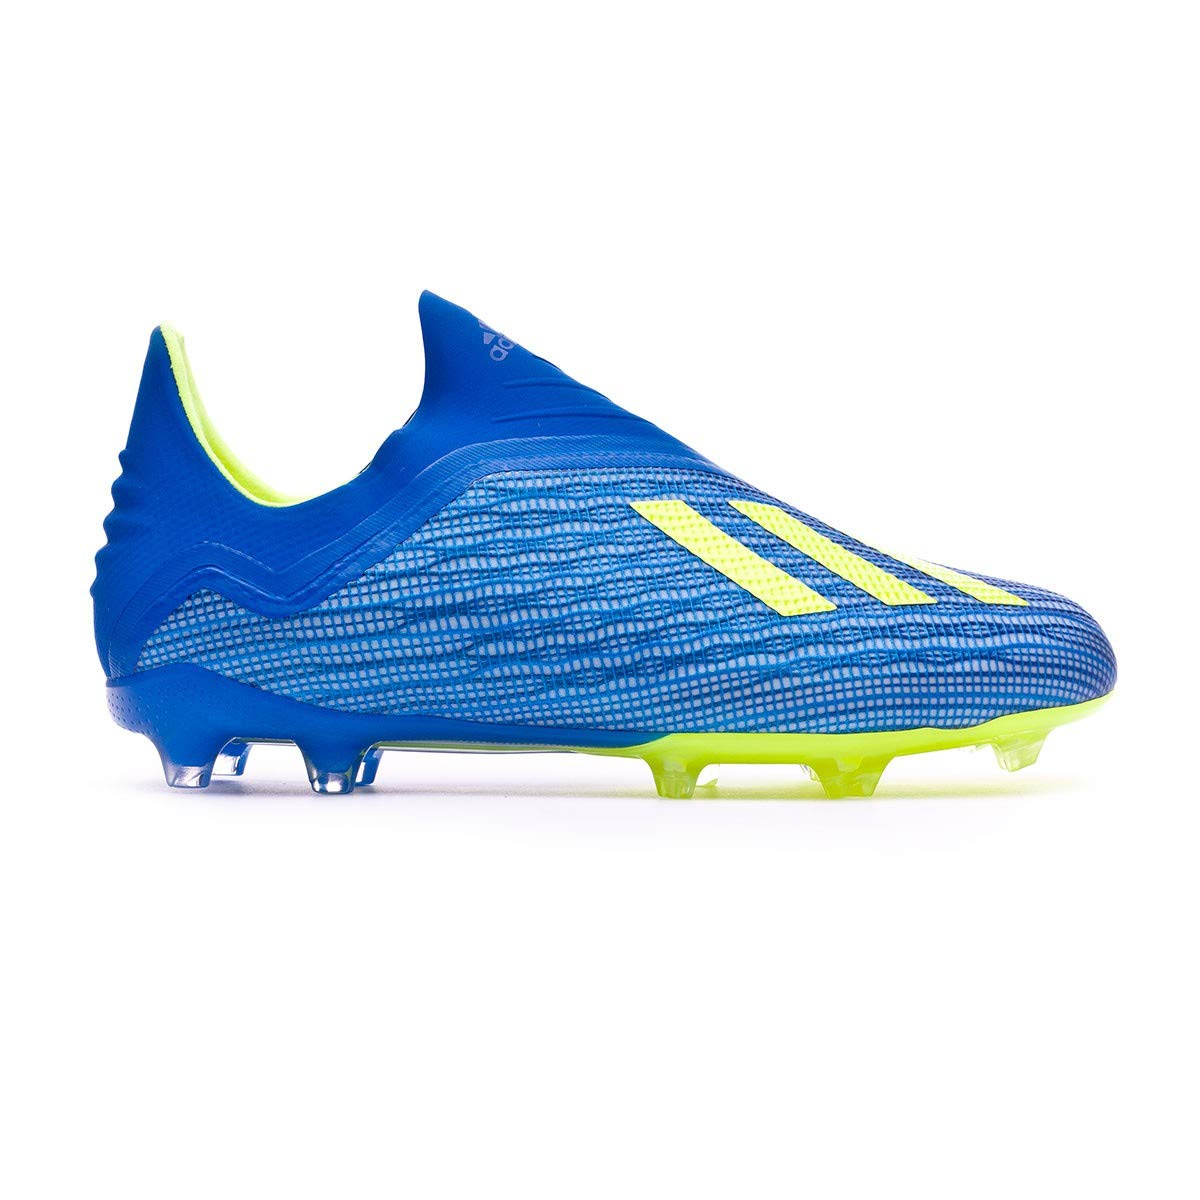 Adidas Unisex-Kinder X 18+ Fg Fußballschuhe